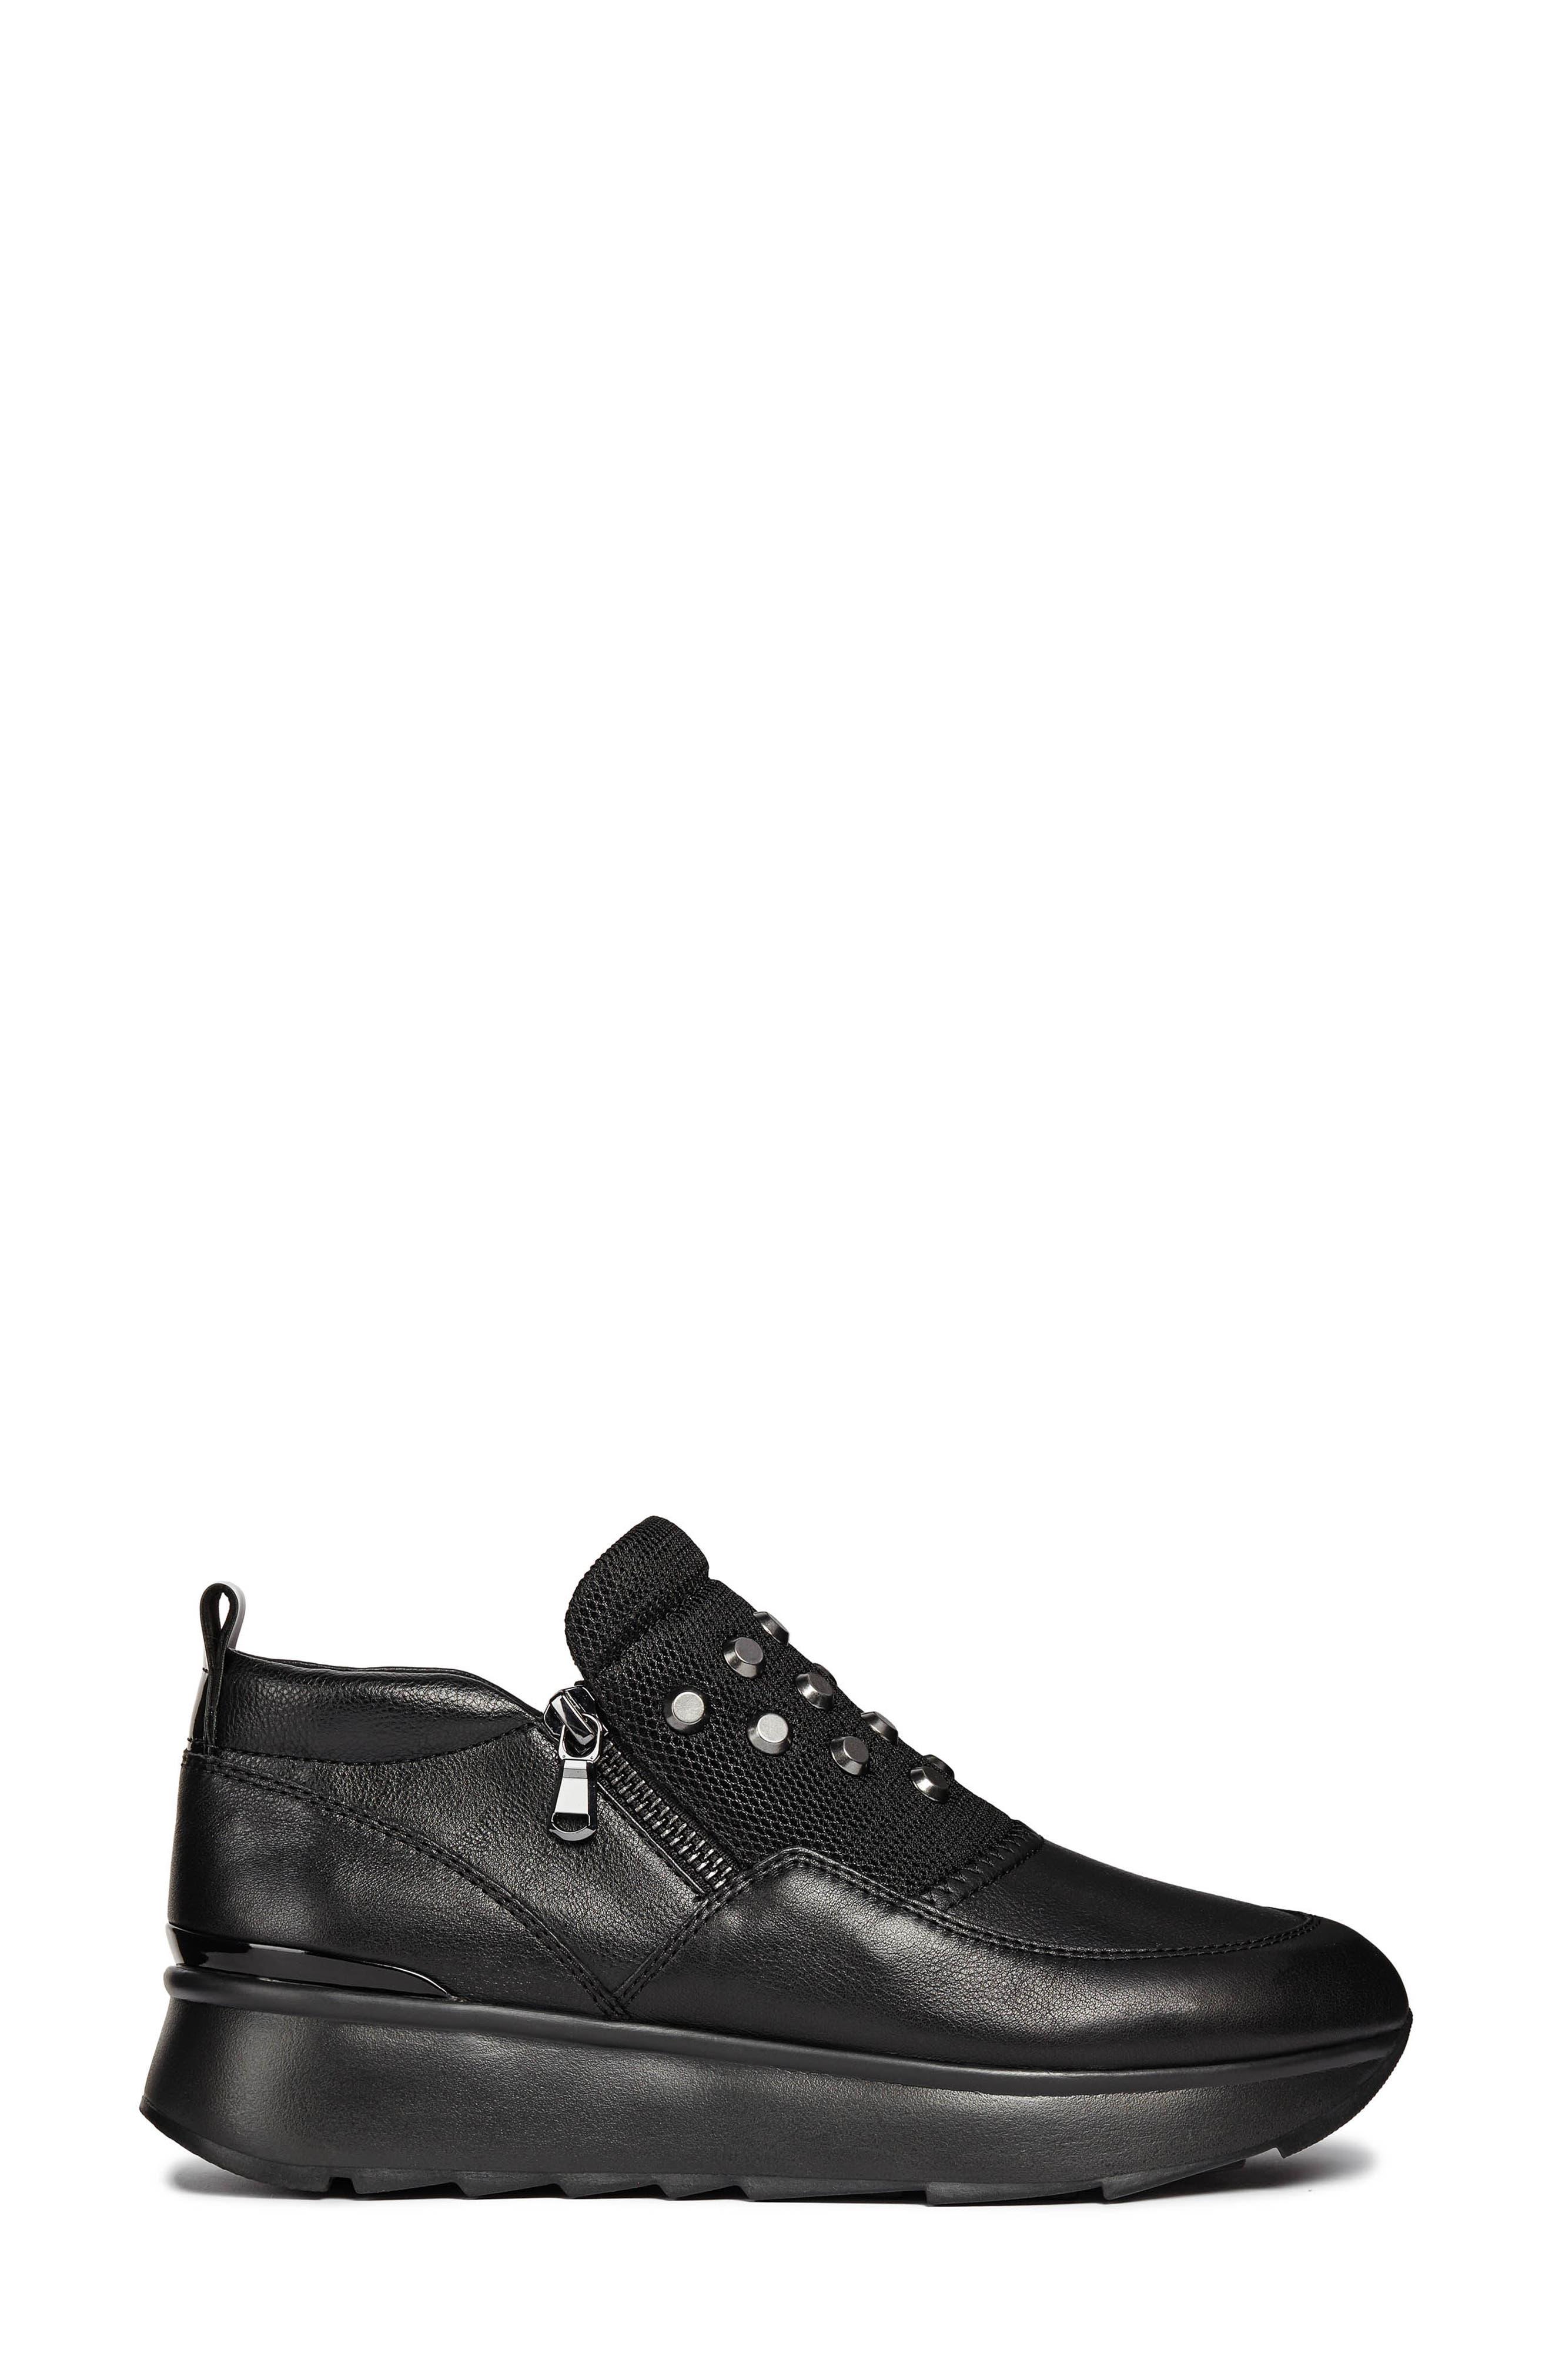 Gendry Sneaker,                             Alternate thumbnail 3, color,                             BLACK LEATHER